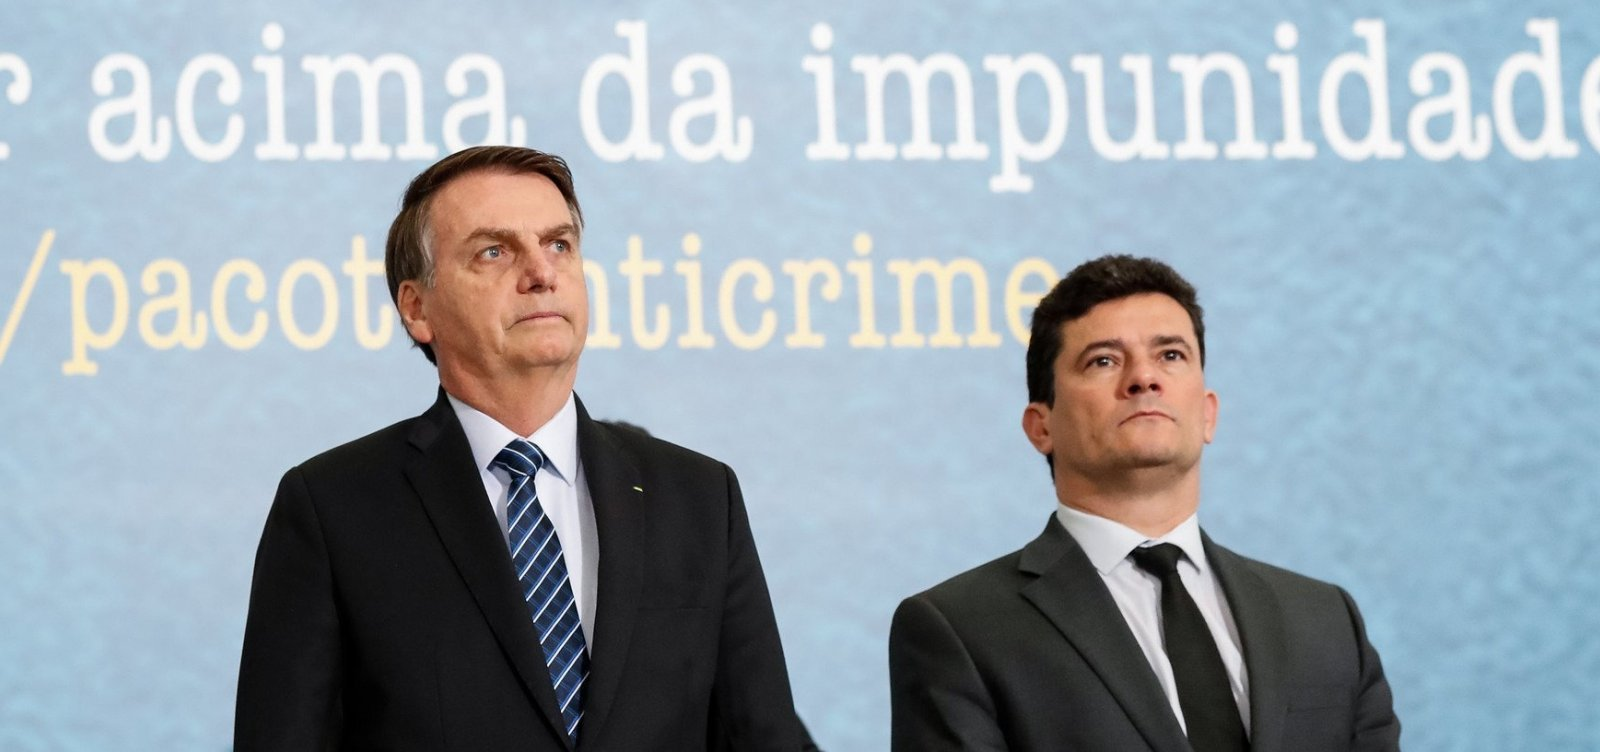 [Vídeo de Bolsonaro reforça versão de interferência na PF para proteger família]